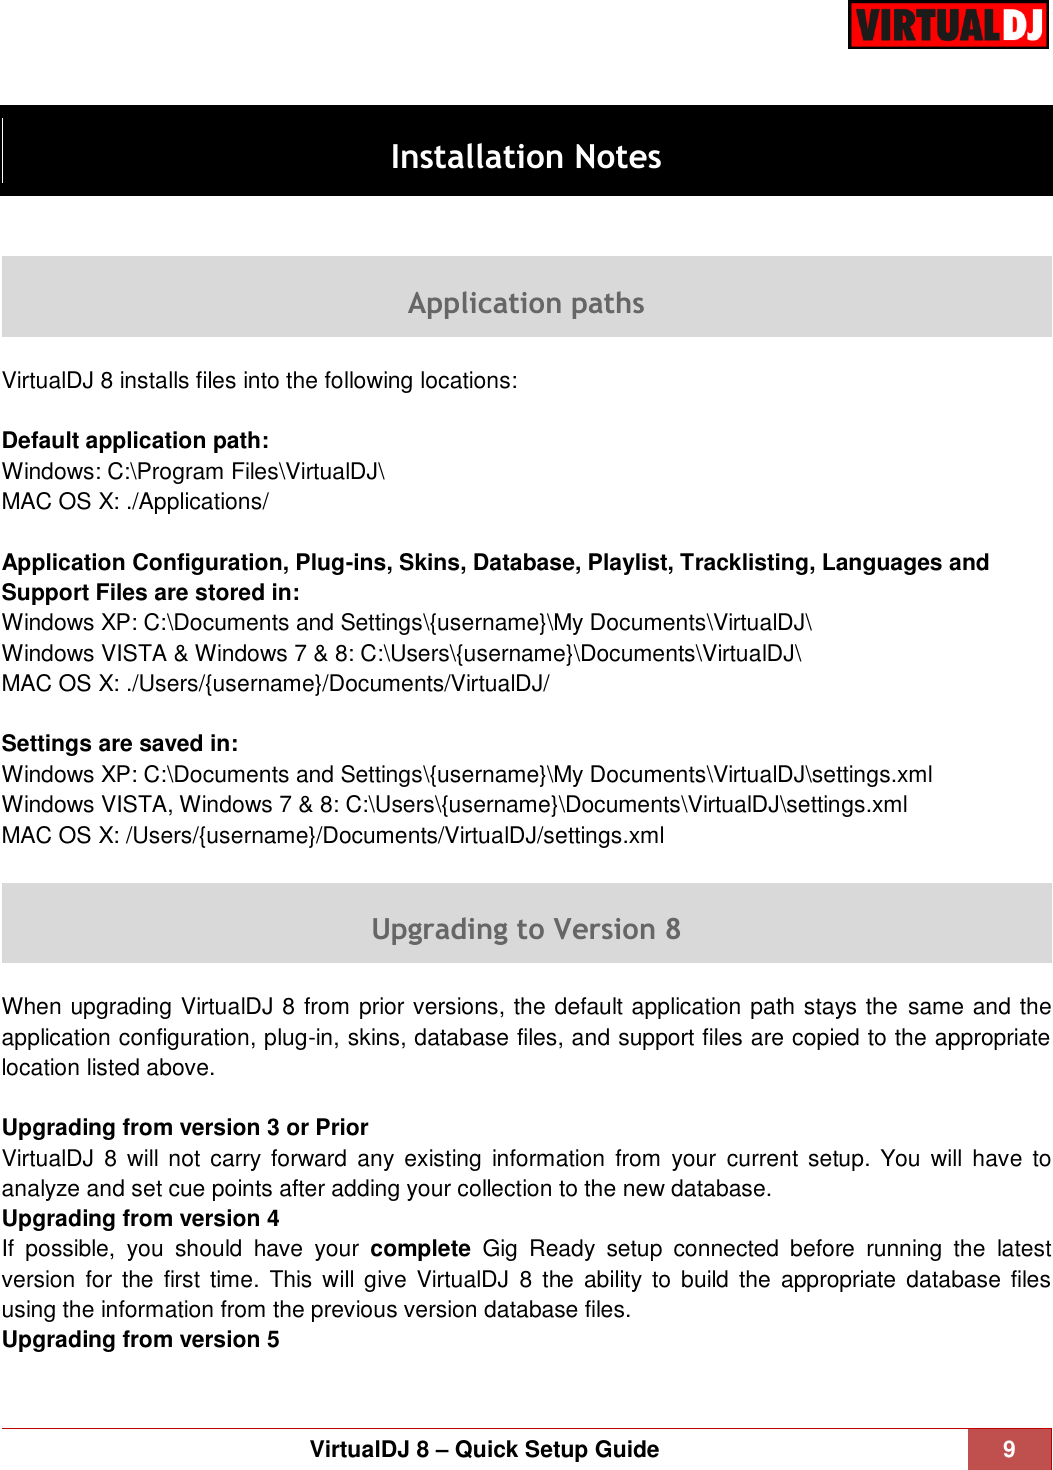 Atomix Productions Virtual Dj 8 0 Quick Setup Guide VirtualDJ